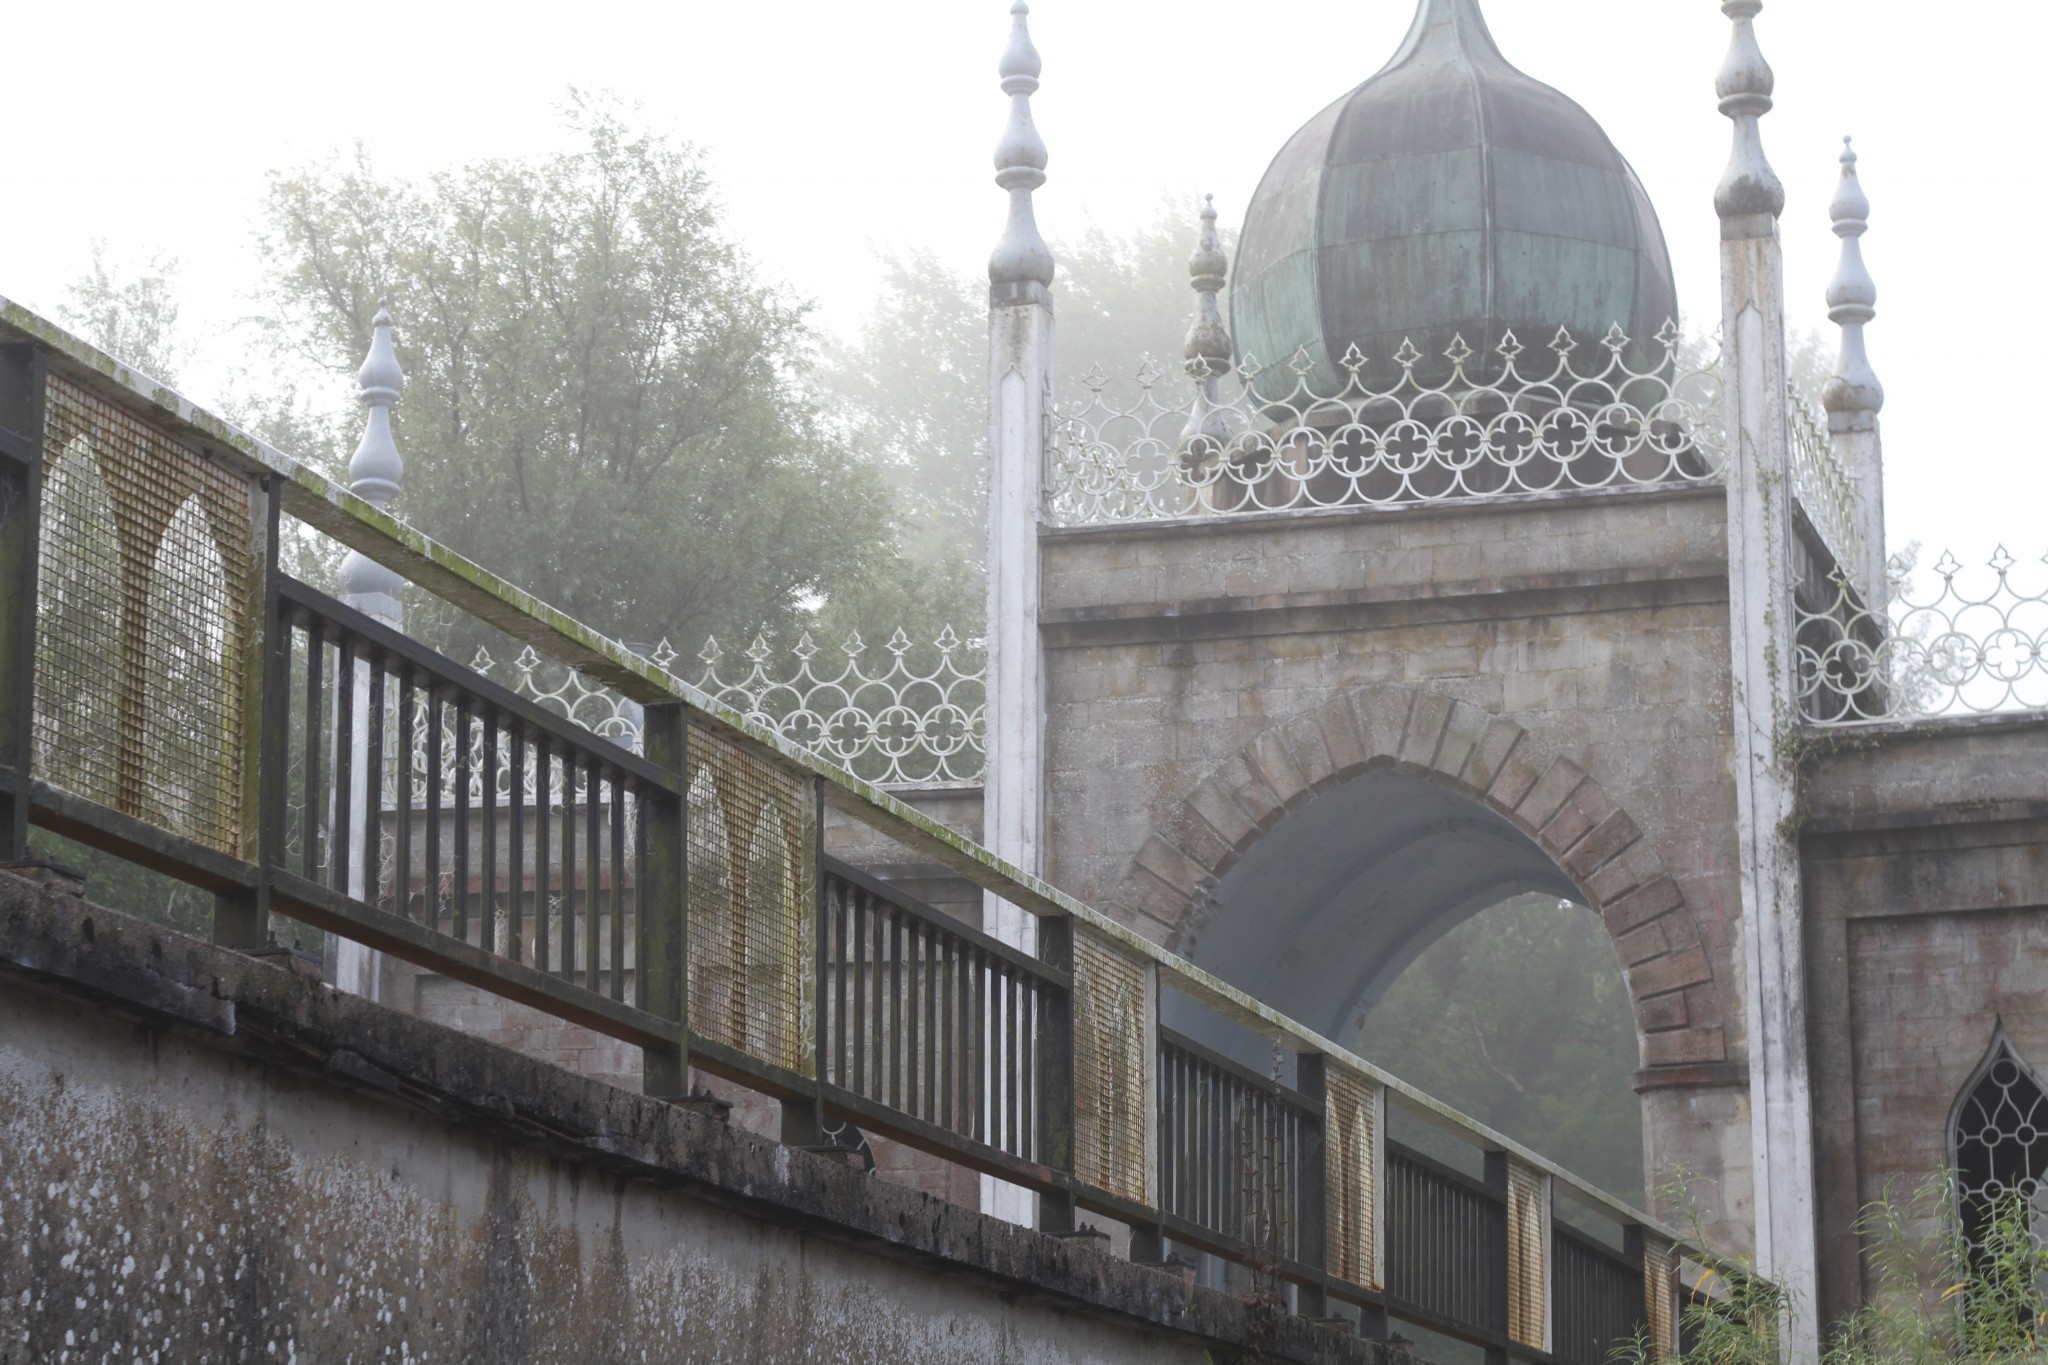 The Indian Wedding Folly Bridge